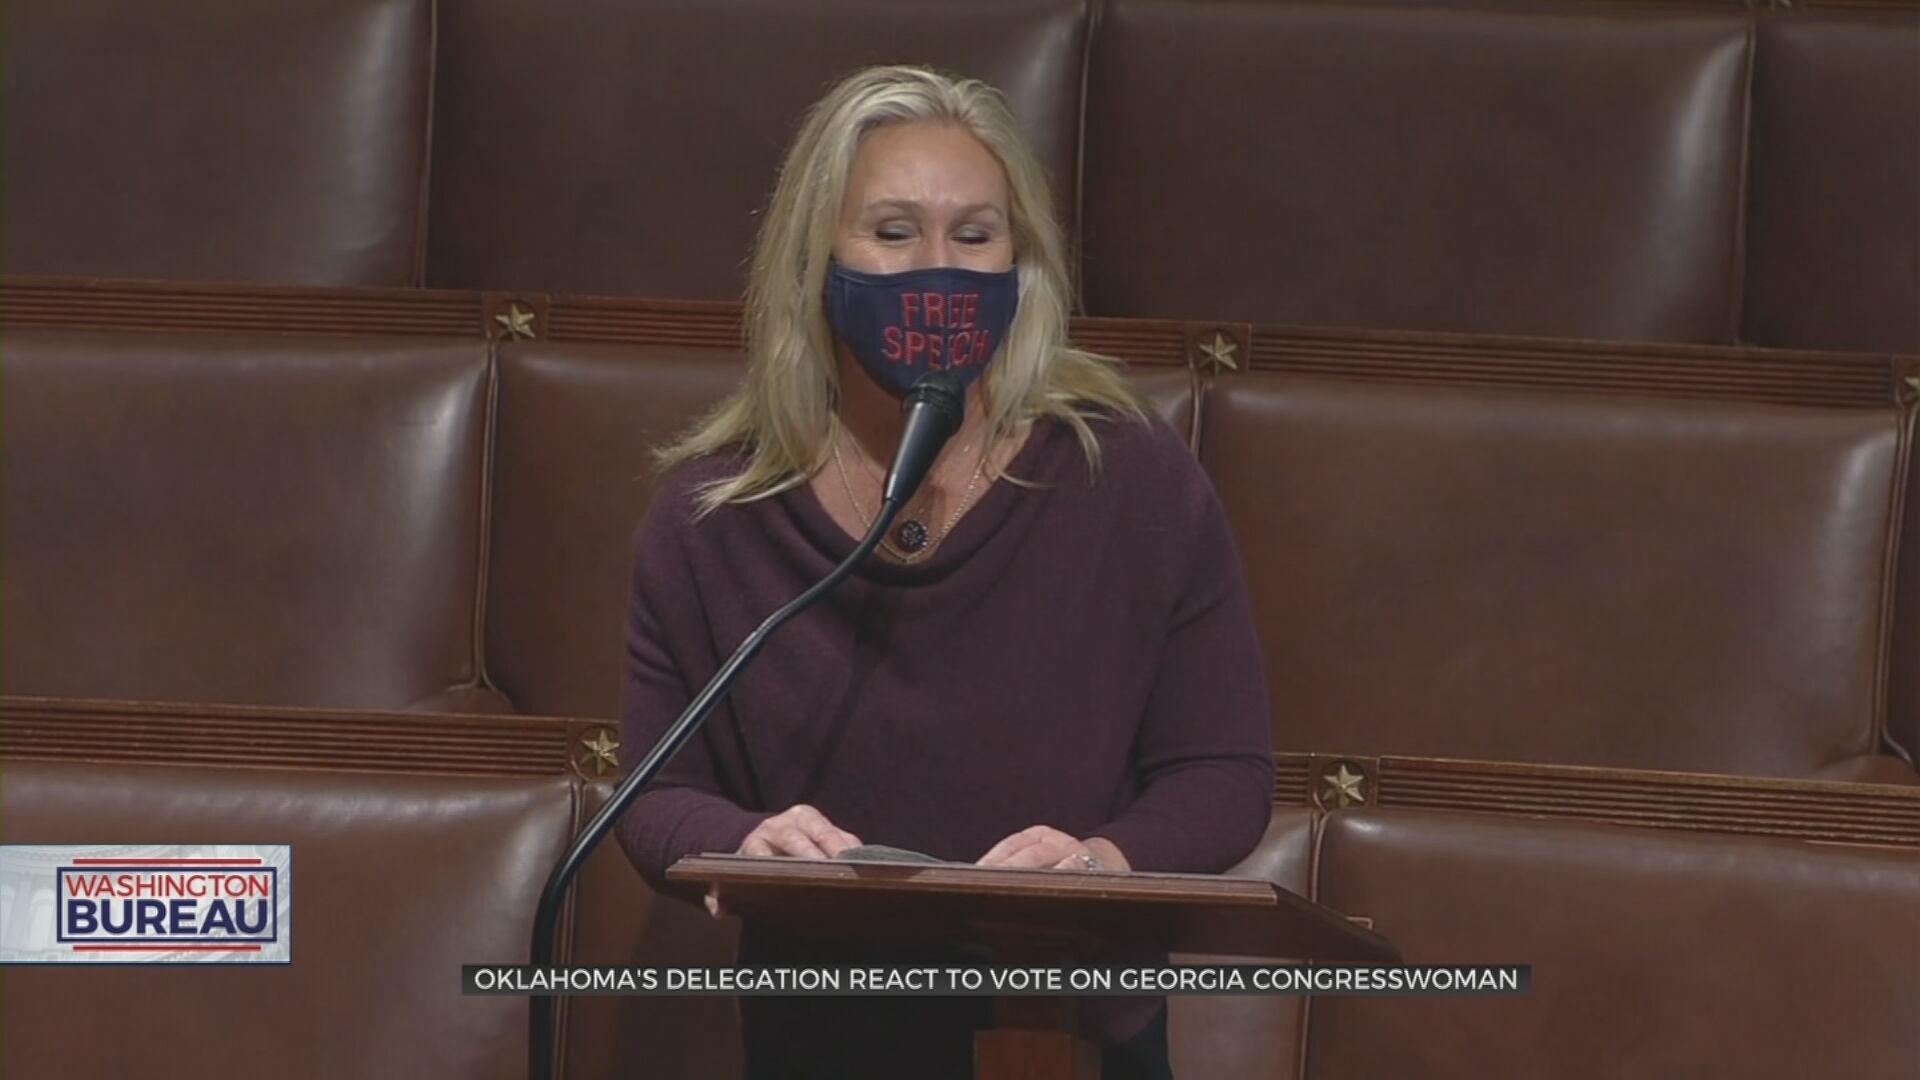 Oklahoma Delegation Speaks On Concerns Surrounding Georgia Congresswoman